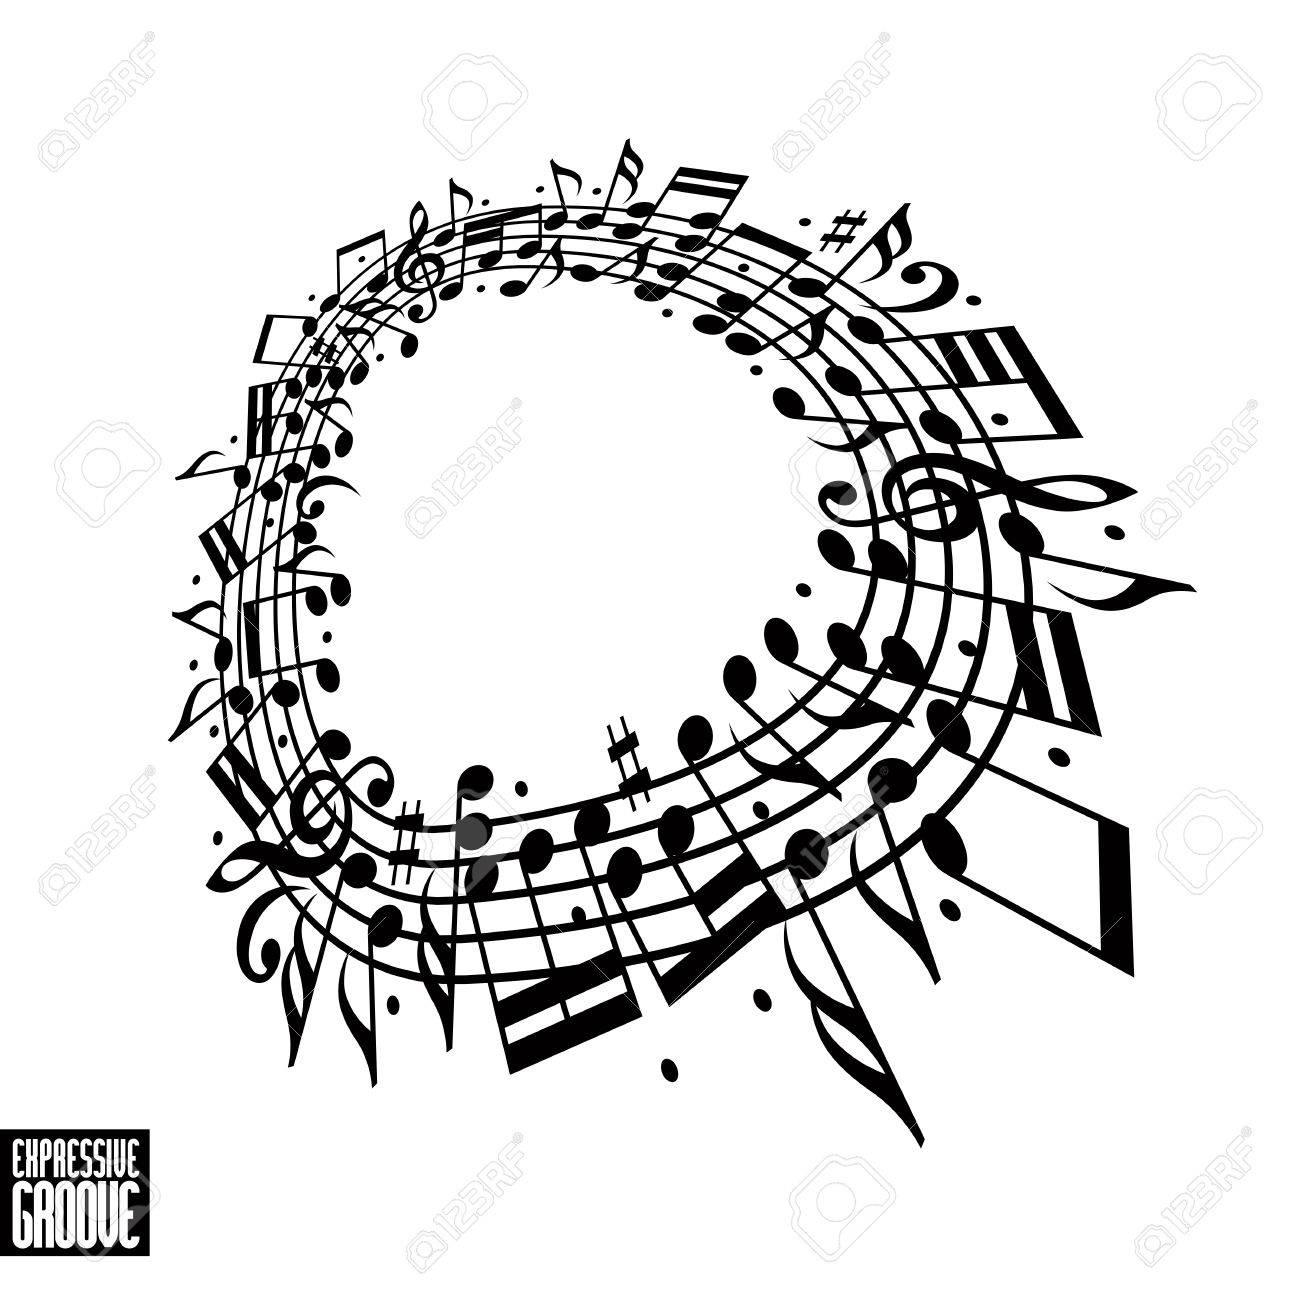 Concepto Ranura Expresivo. Diseño Blanco Y Negro. Música De Fondo ...